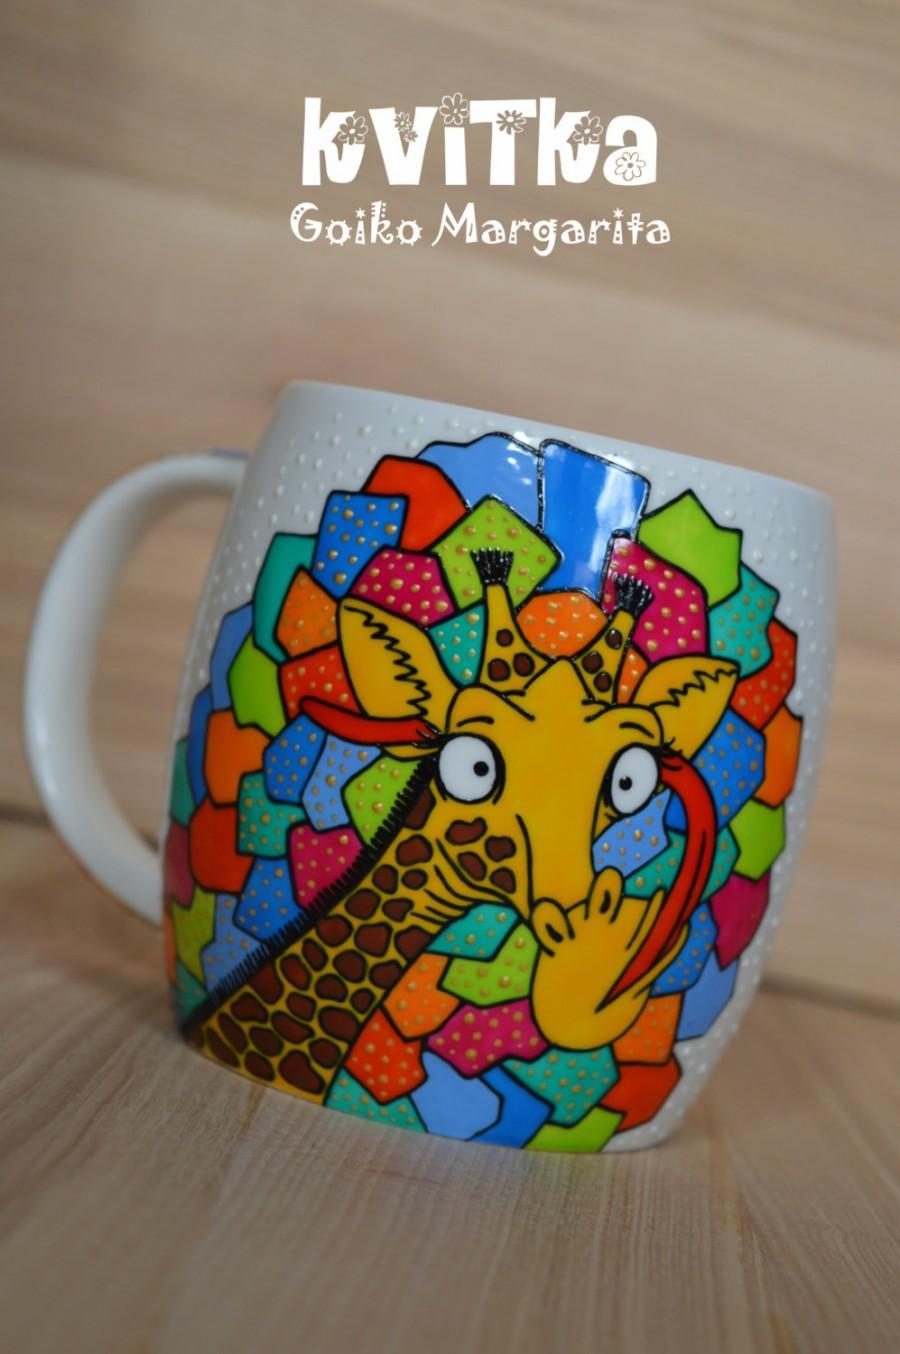 Funny Mug Giraffe Mug Coffee Mug For Him Birthday Gift Handpainted Mug Cute Coffee Mug Personalized Mug Ceramic Mug Funny Giraffe Custom Mug 2747791 Weddbook